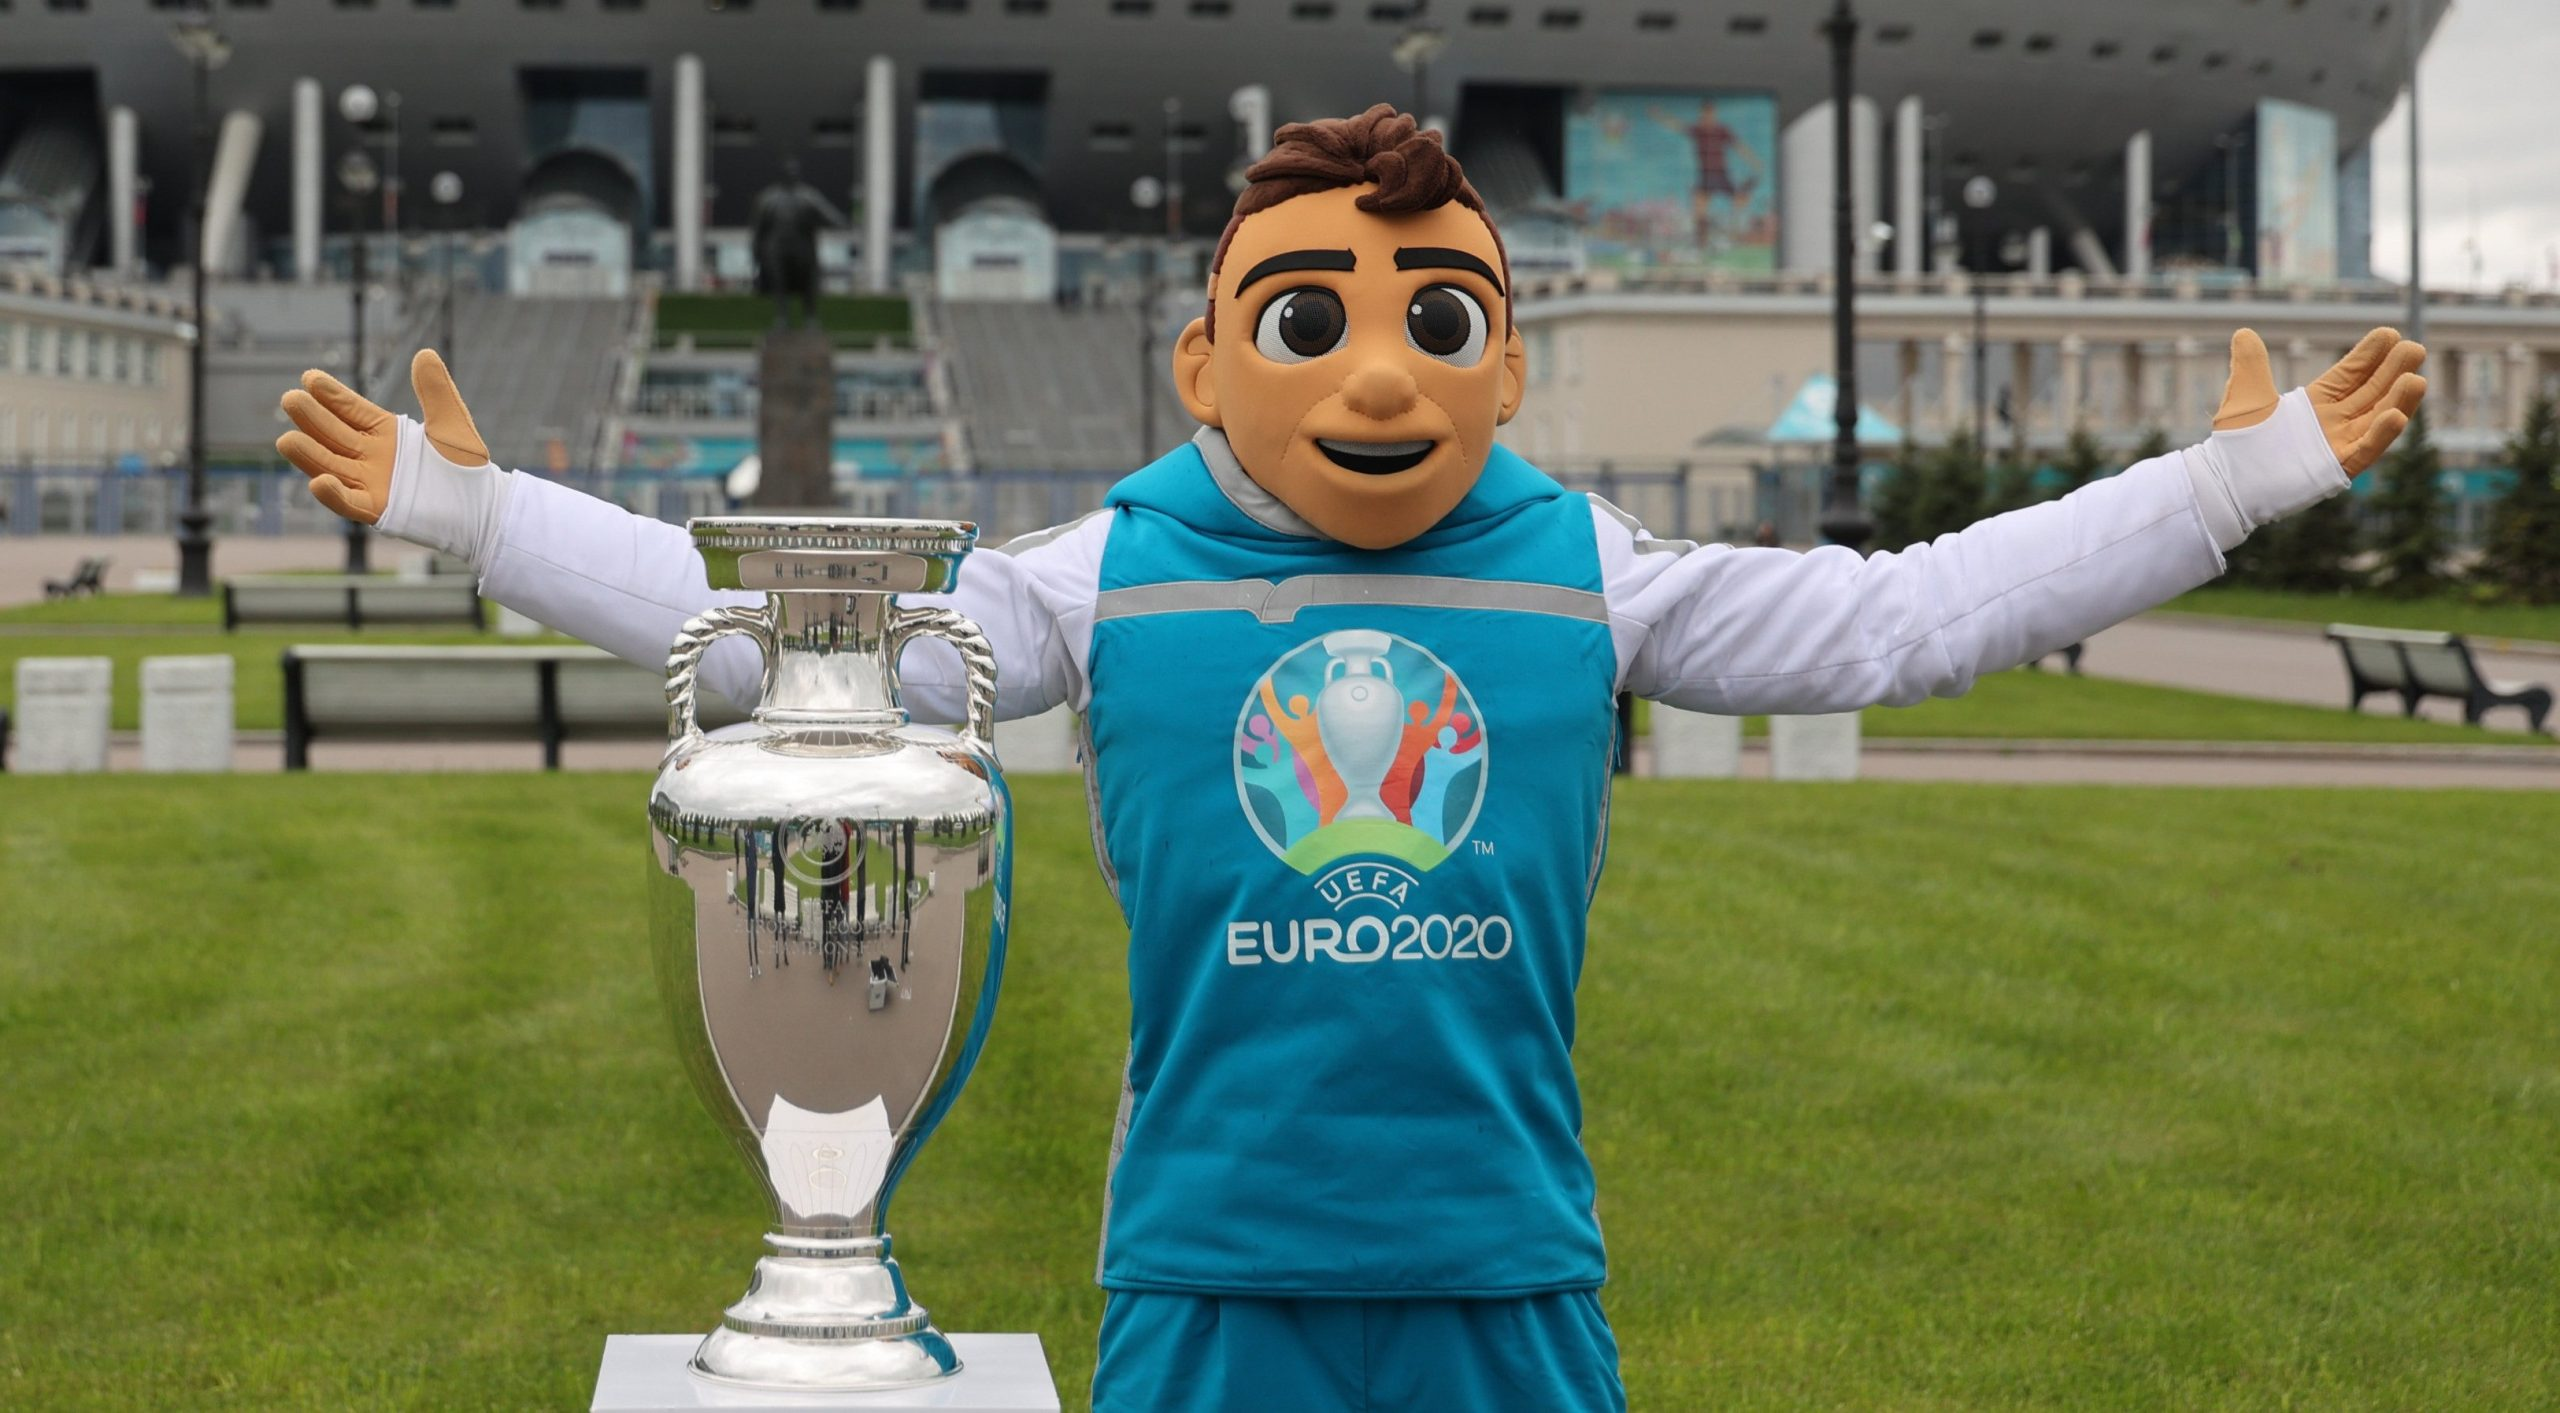 Jadwal Euro 2020 – 2021